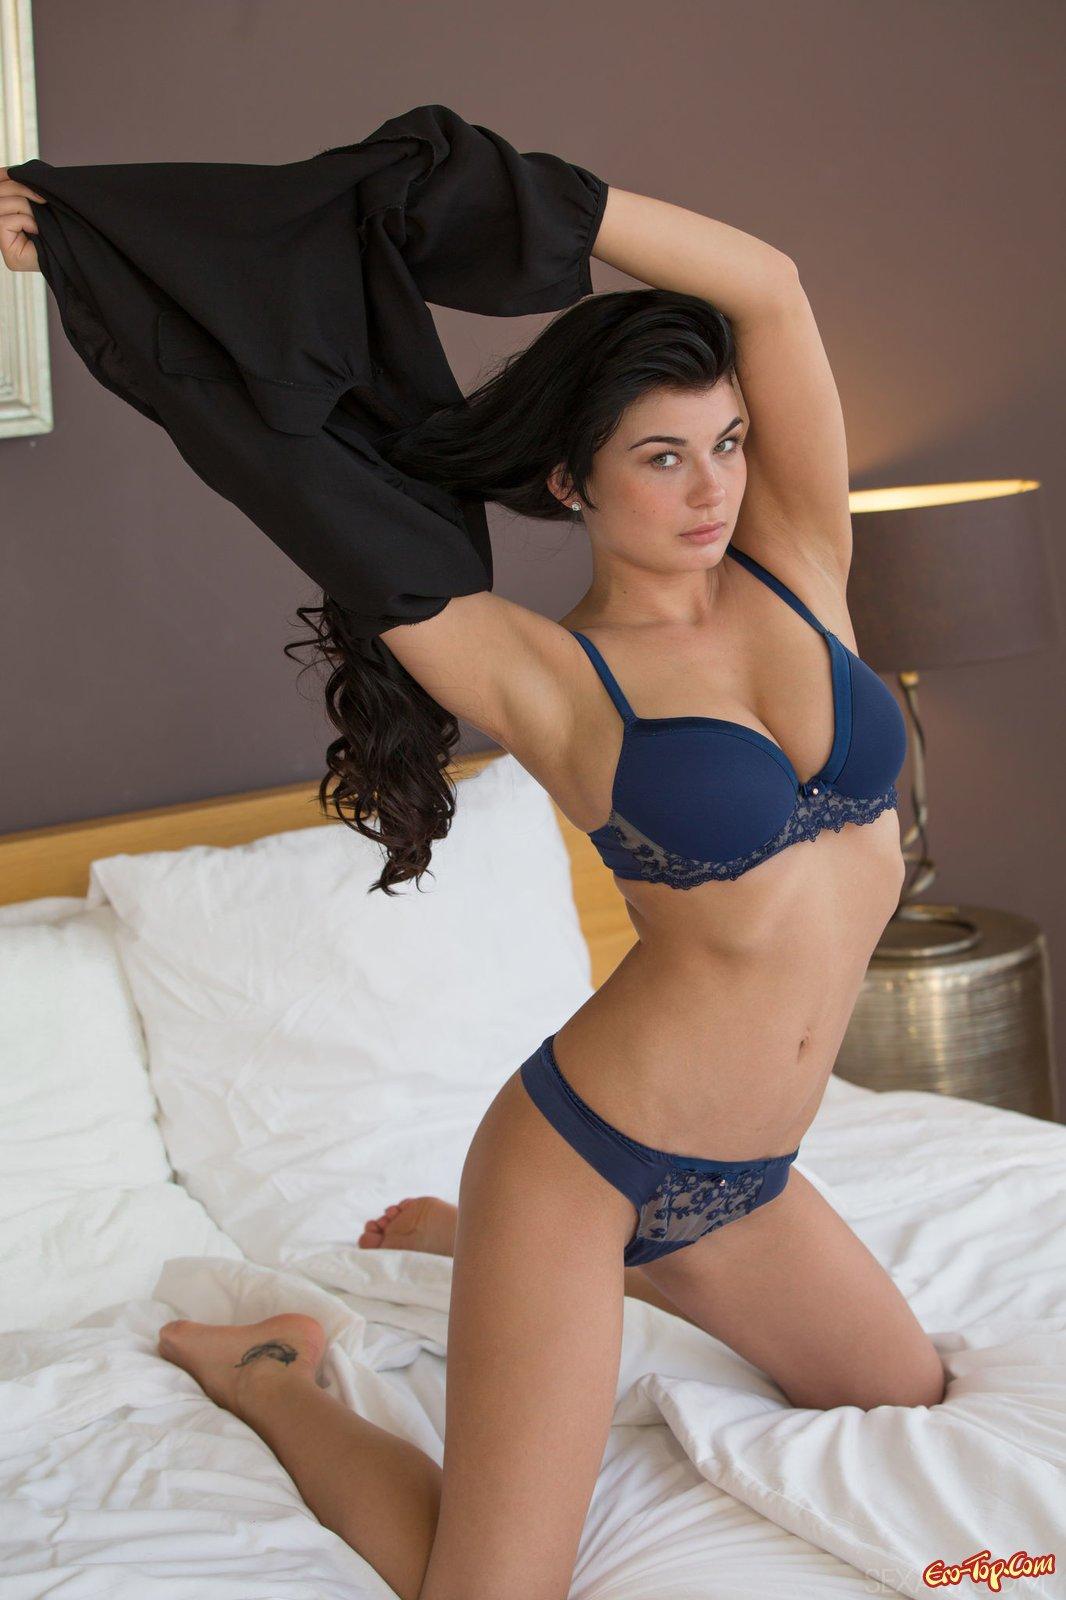 Шатенка с гигантской грудью снимает бикини на лежанке